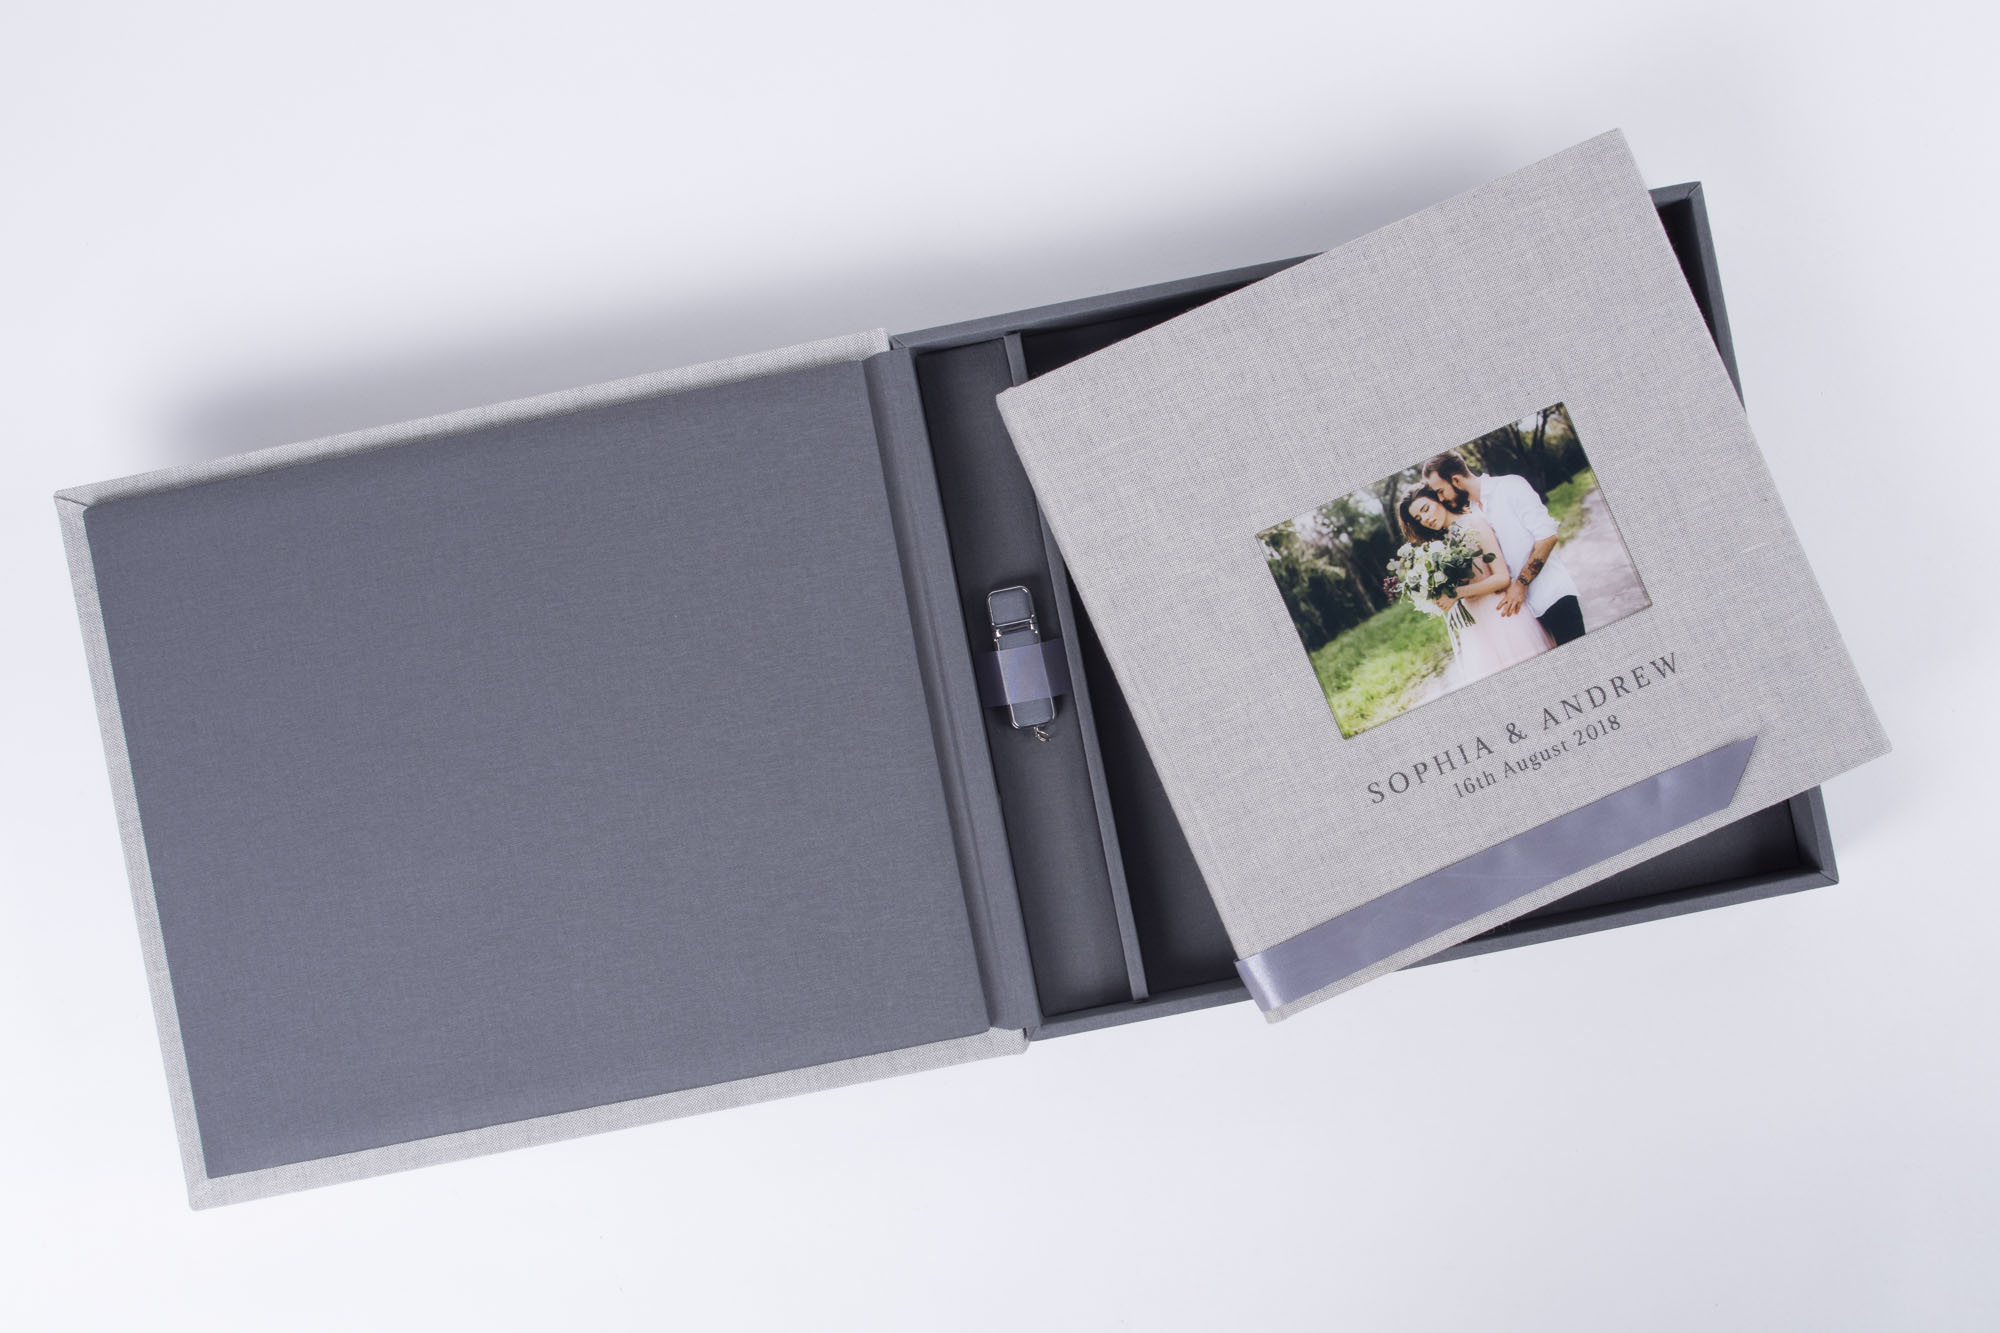 Premium Fotobuch mit individuellem Design